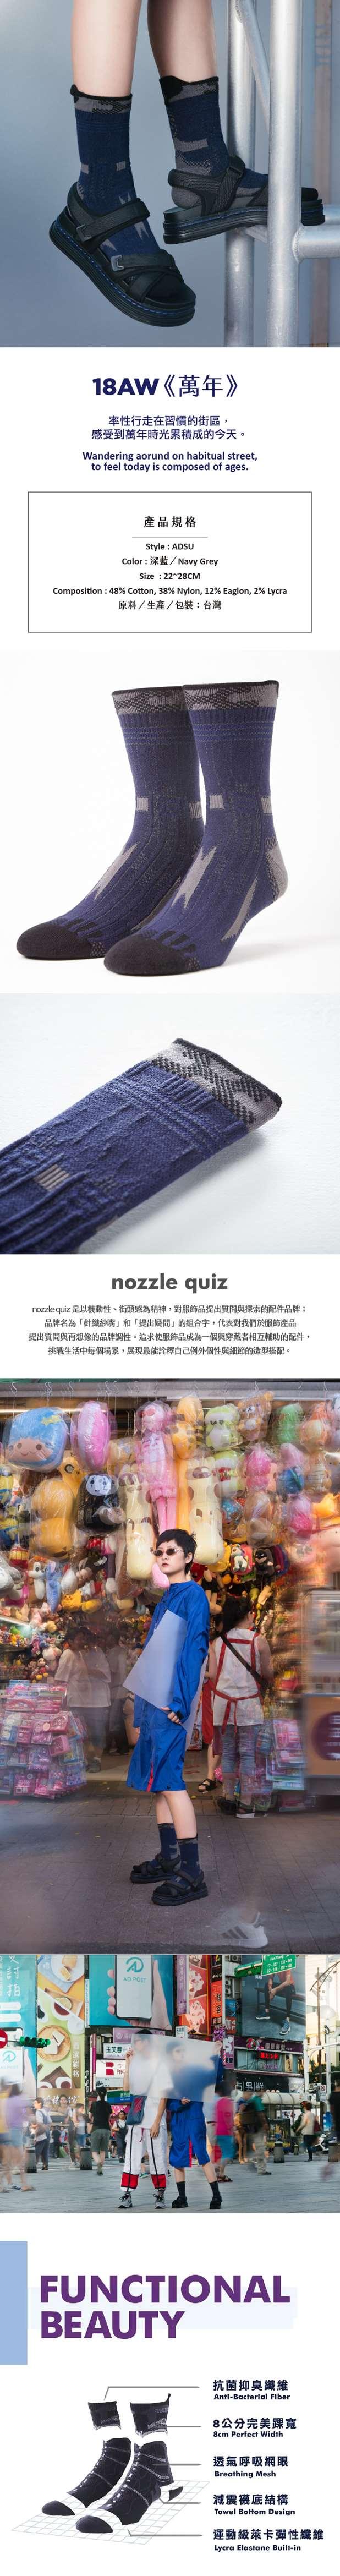 (複製)nozzle quiz│YOSHA ST. 蔚藍 - 休閒短襪